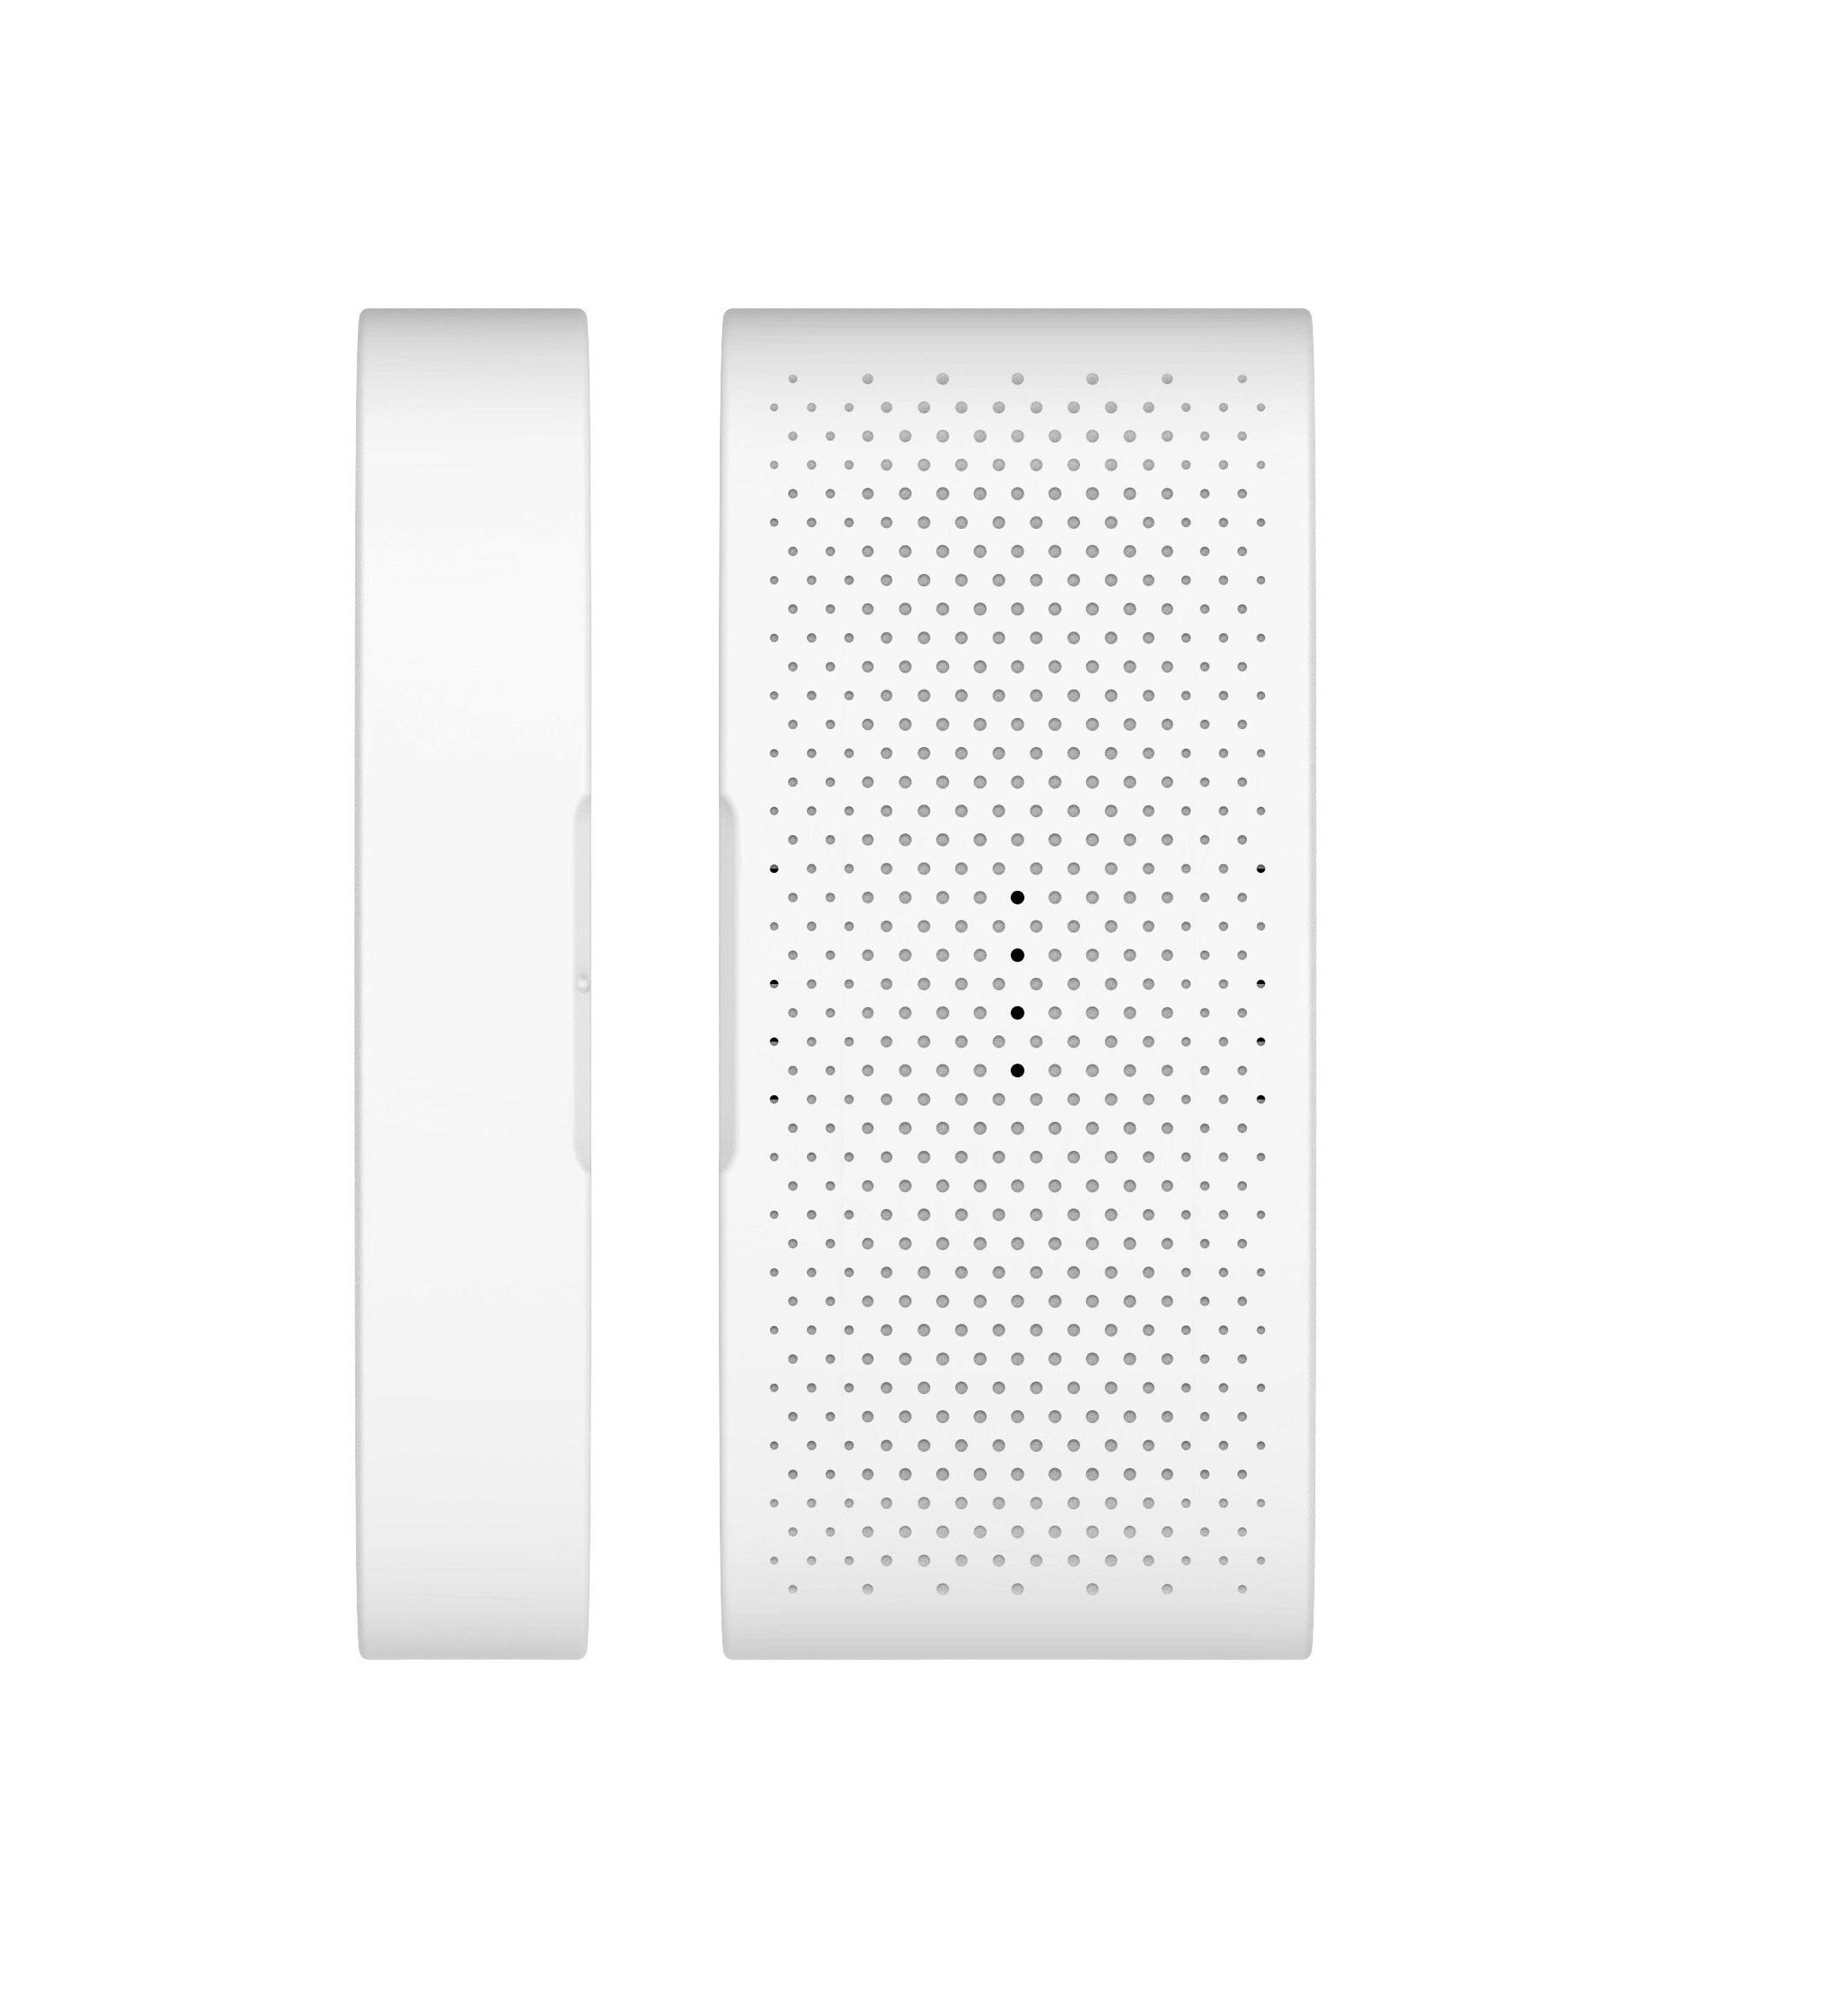 iGET SECURITY DP4 - bezdrátový smart detektor pro dveře/okna pro alarm M4 - SECURITY DP4